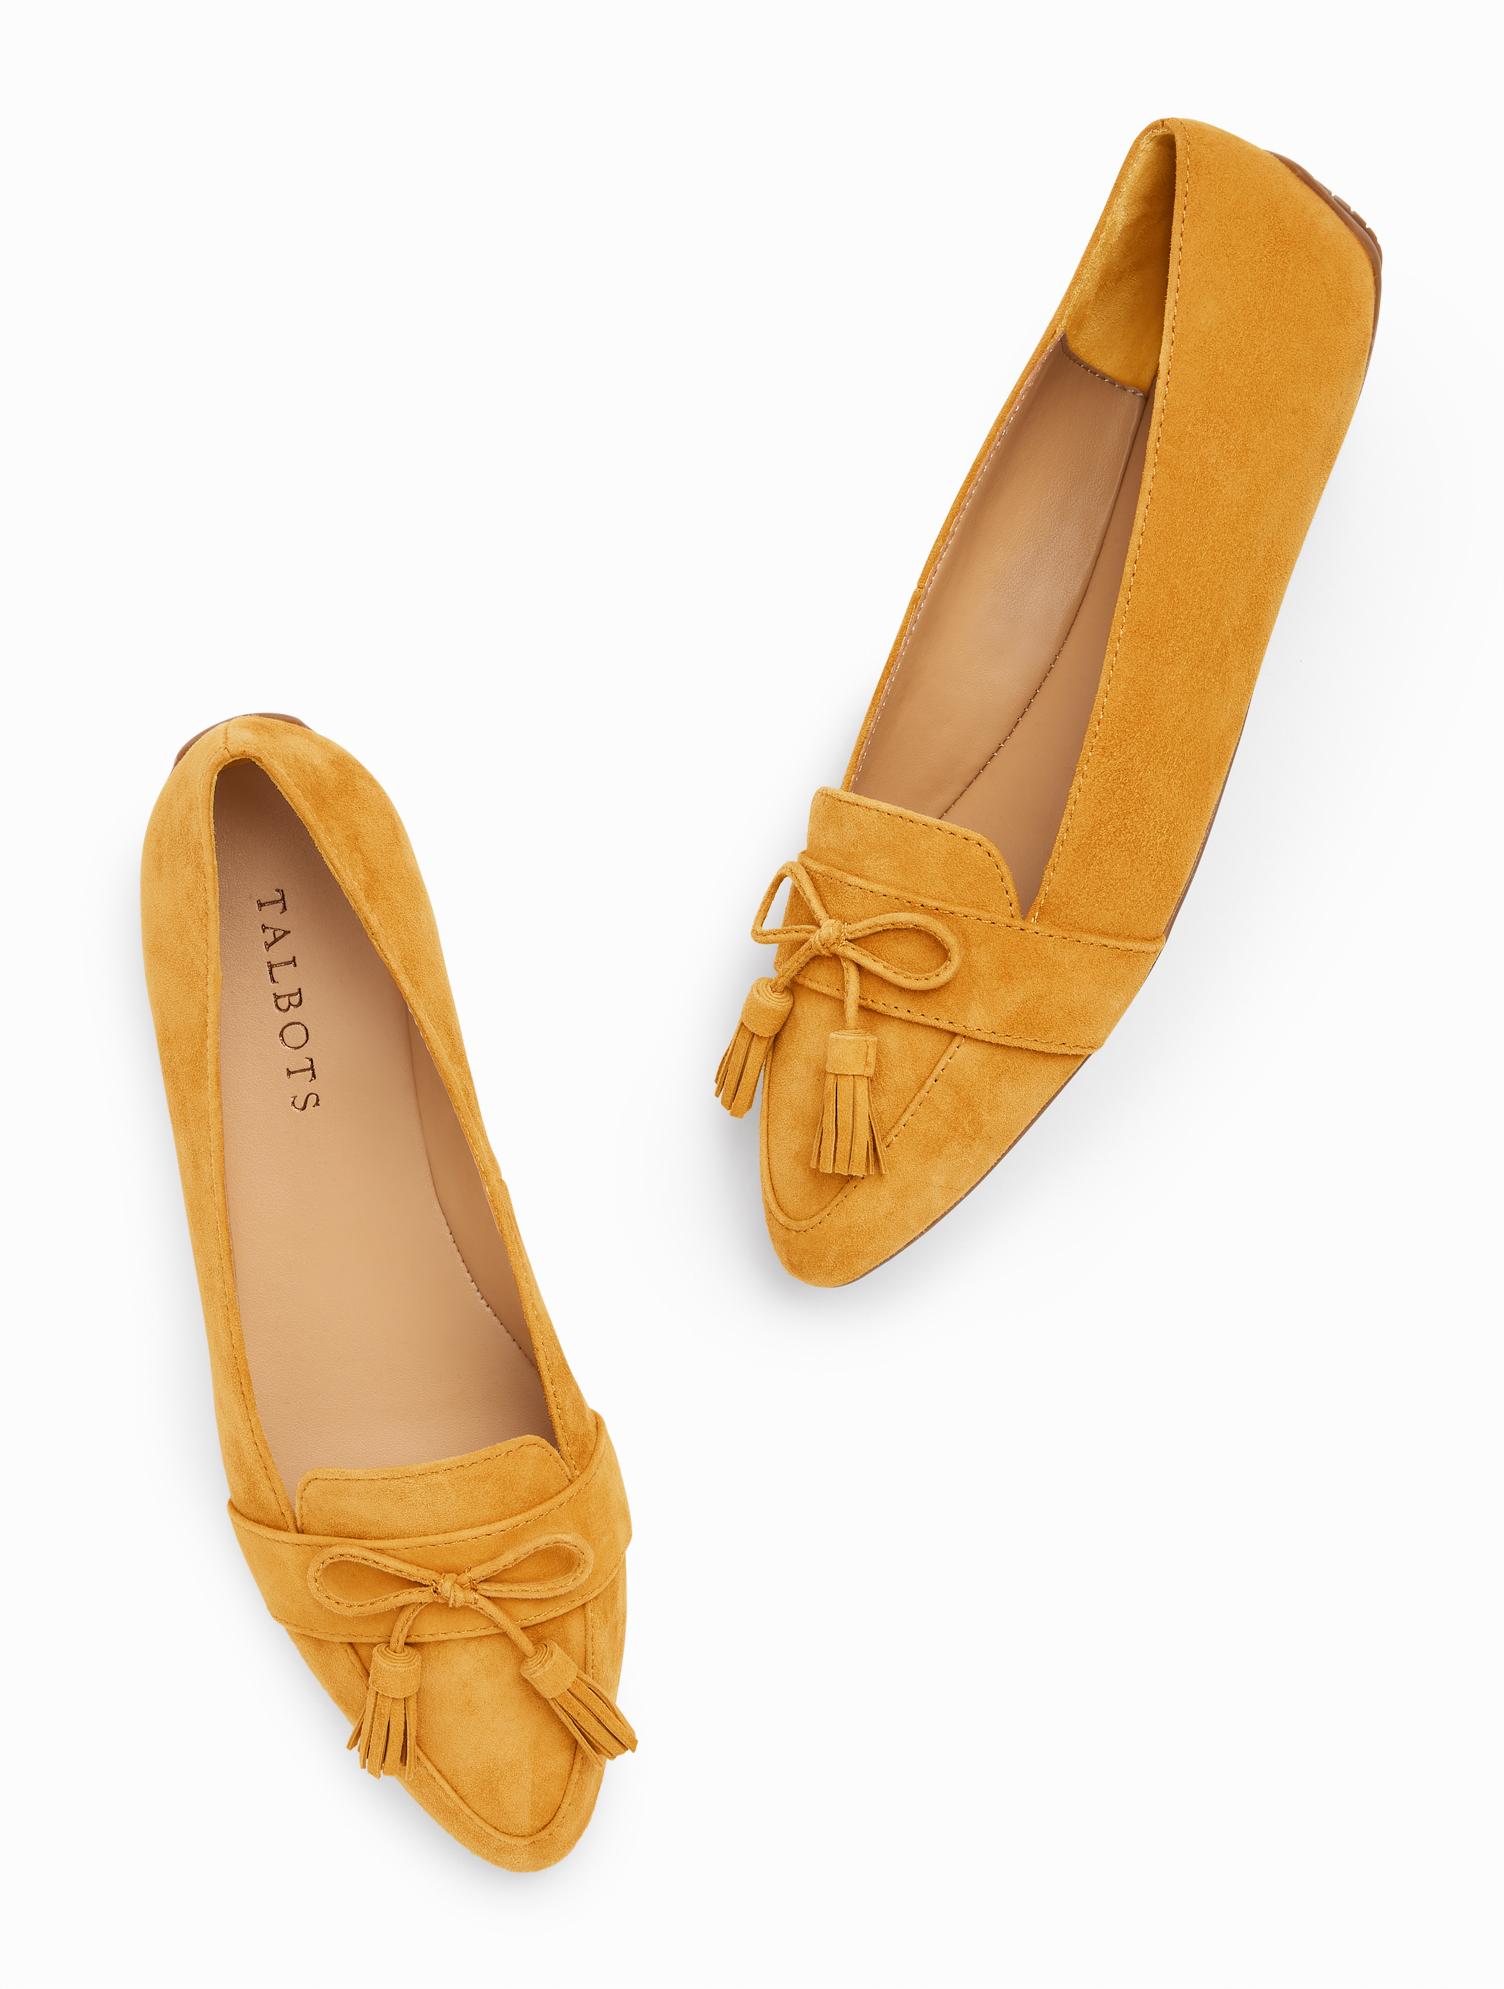 70s Shoes, Platforms, Boots, Heels | 1970s Shoes Francesca Driving Flats - Suede - Amber Gold - 11M Talbots $119.00 AT vintagedancer.com